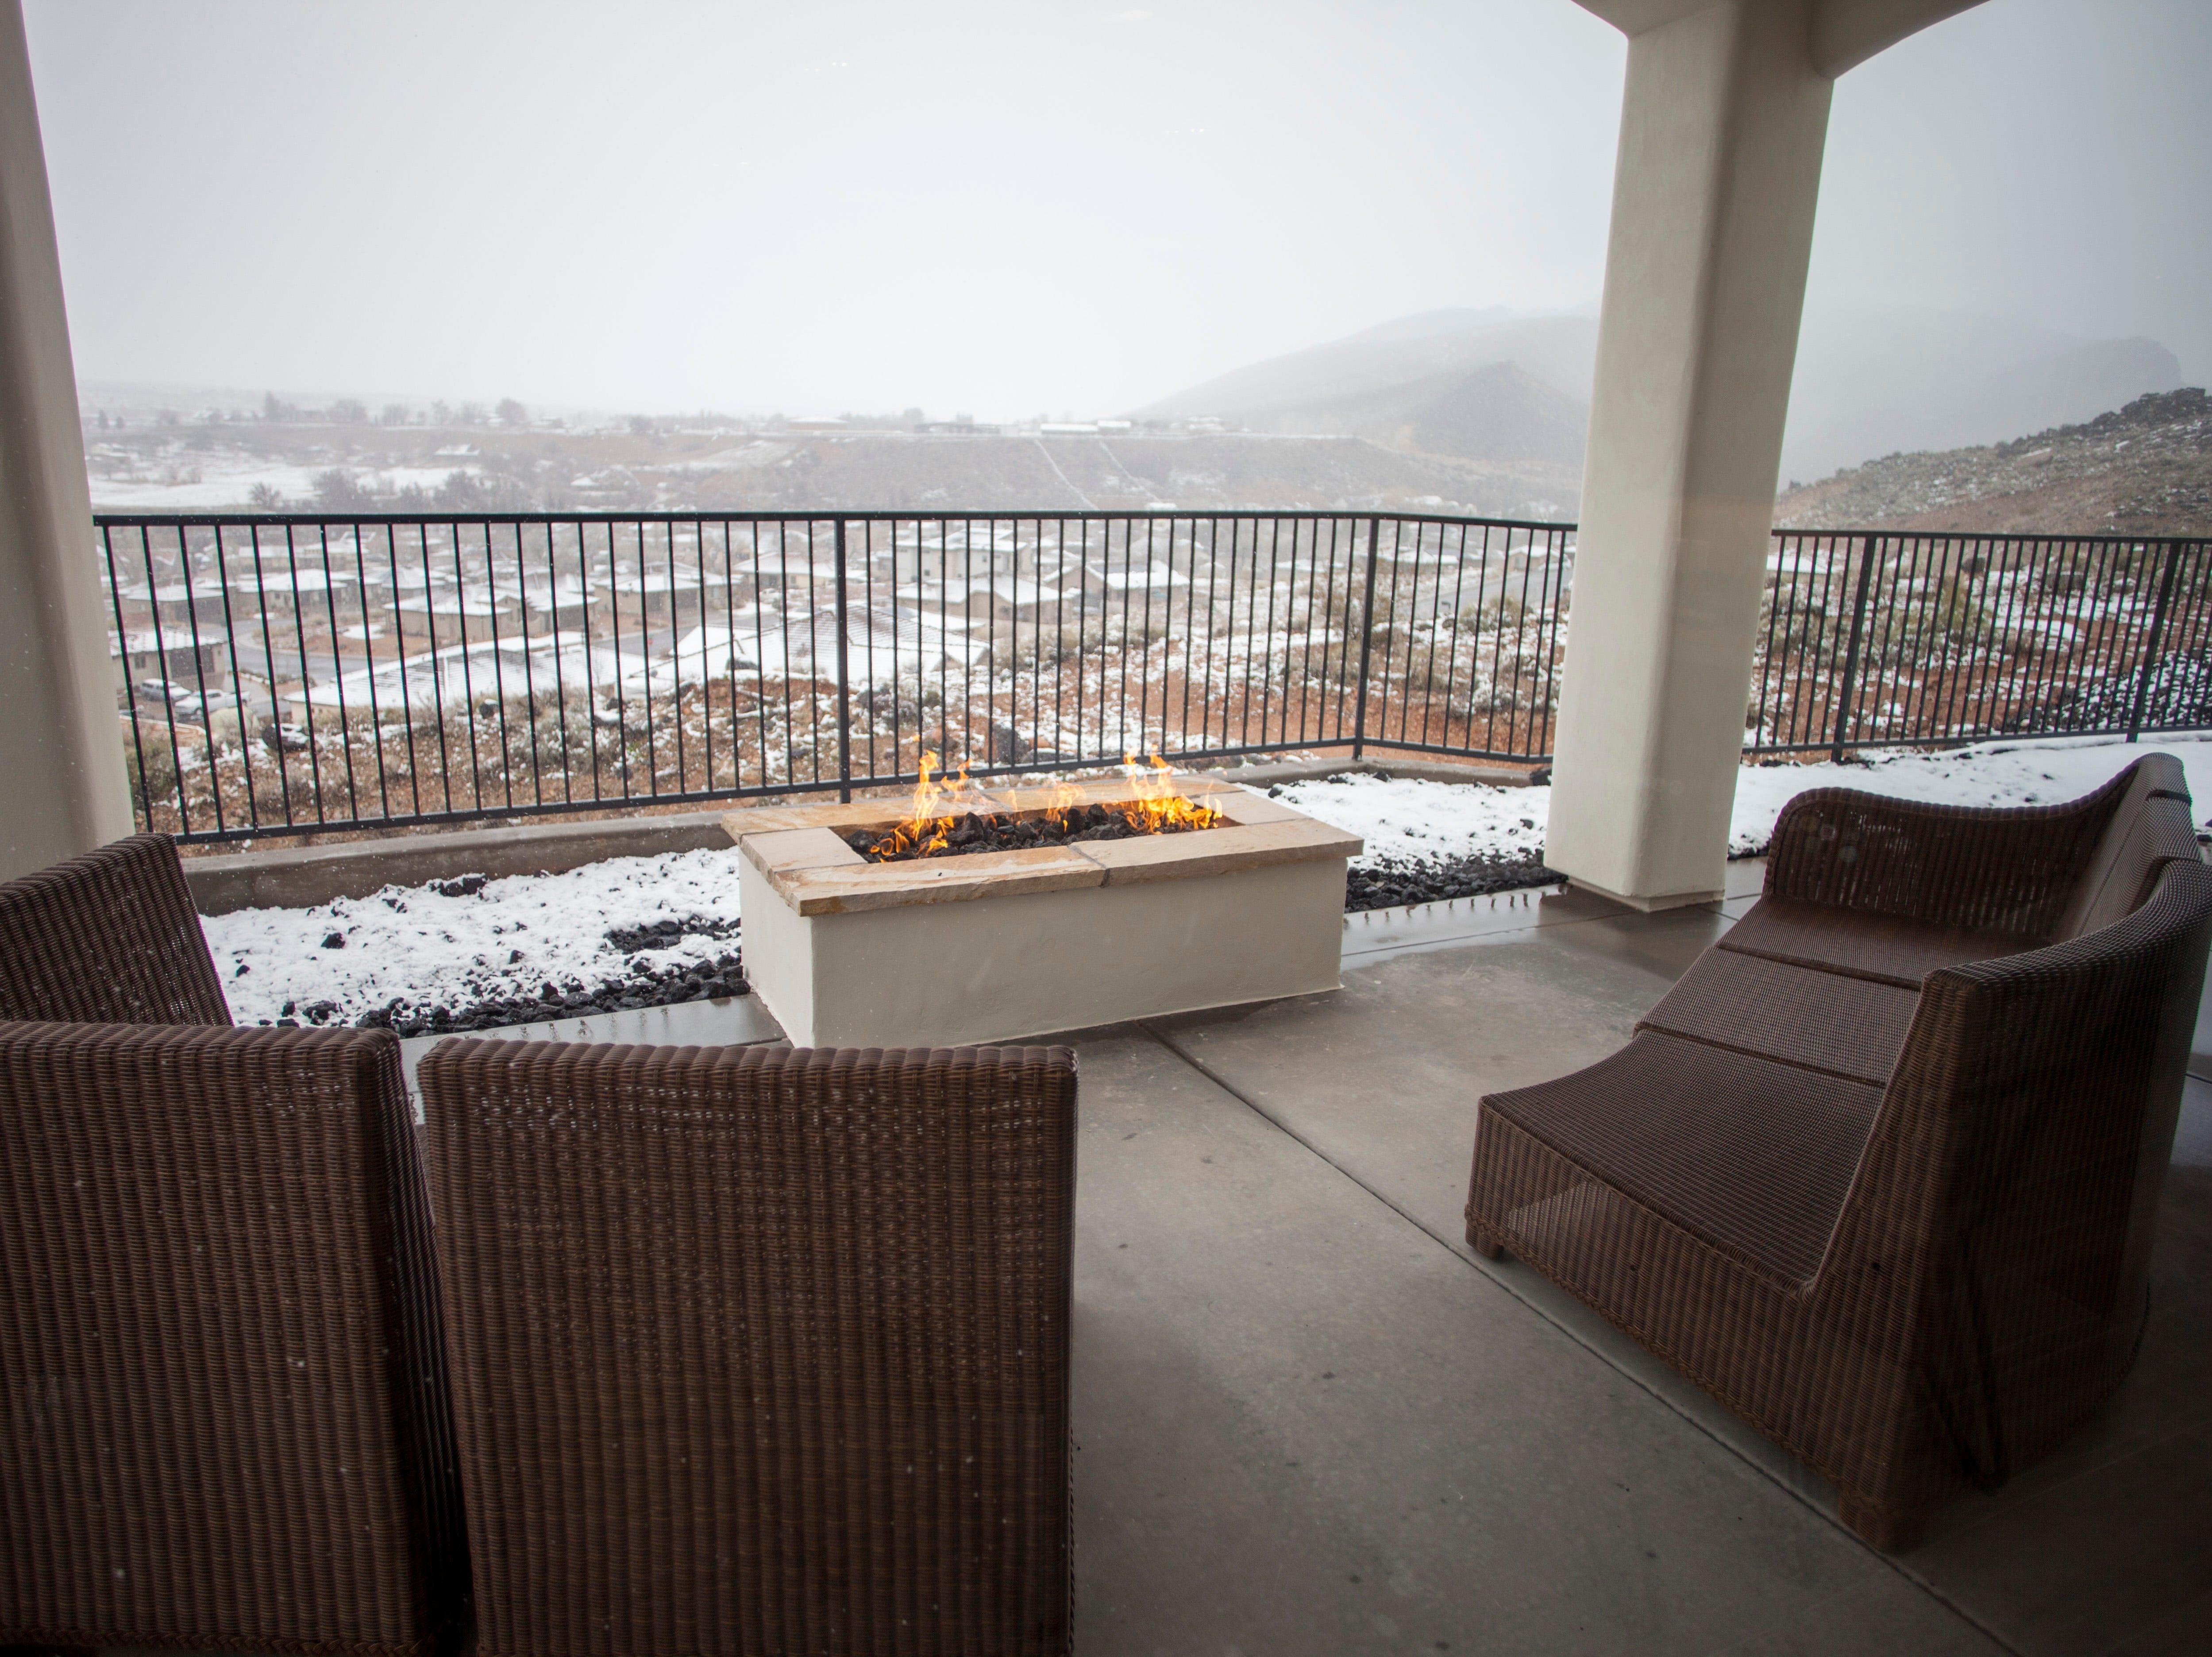 House number 6, Mesa Views at Trail Ridge Estates, on the 2019 Parade of Homes Saturday, Feb. 23, 2019.